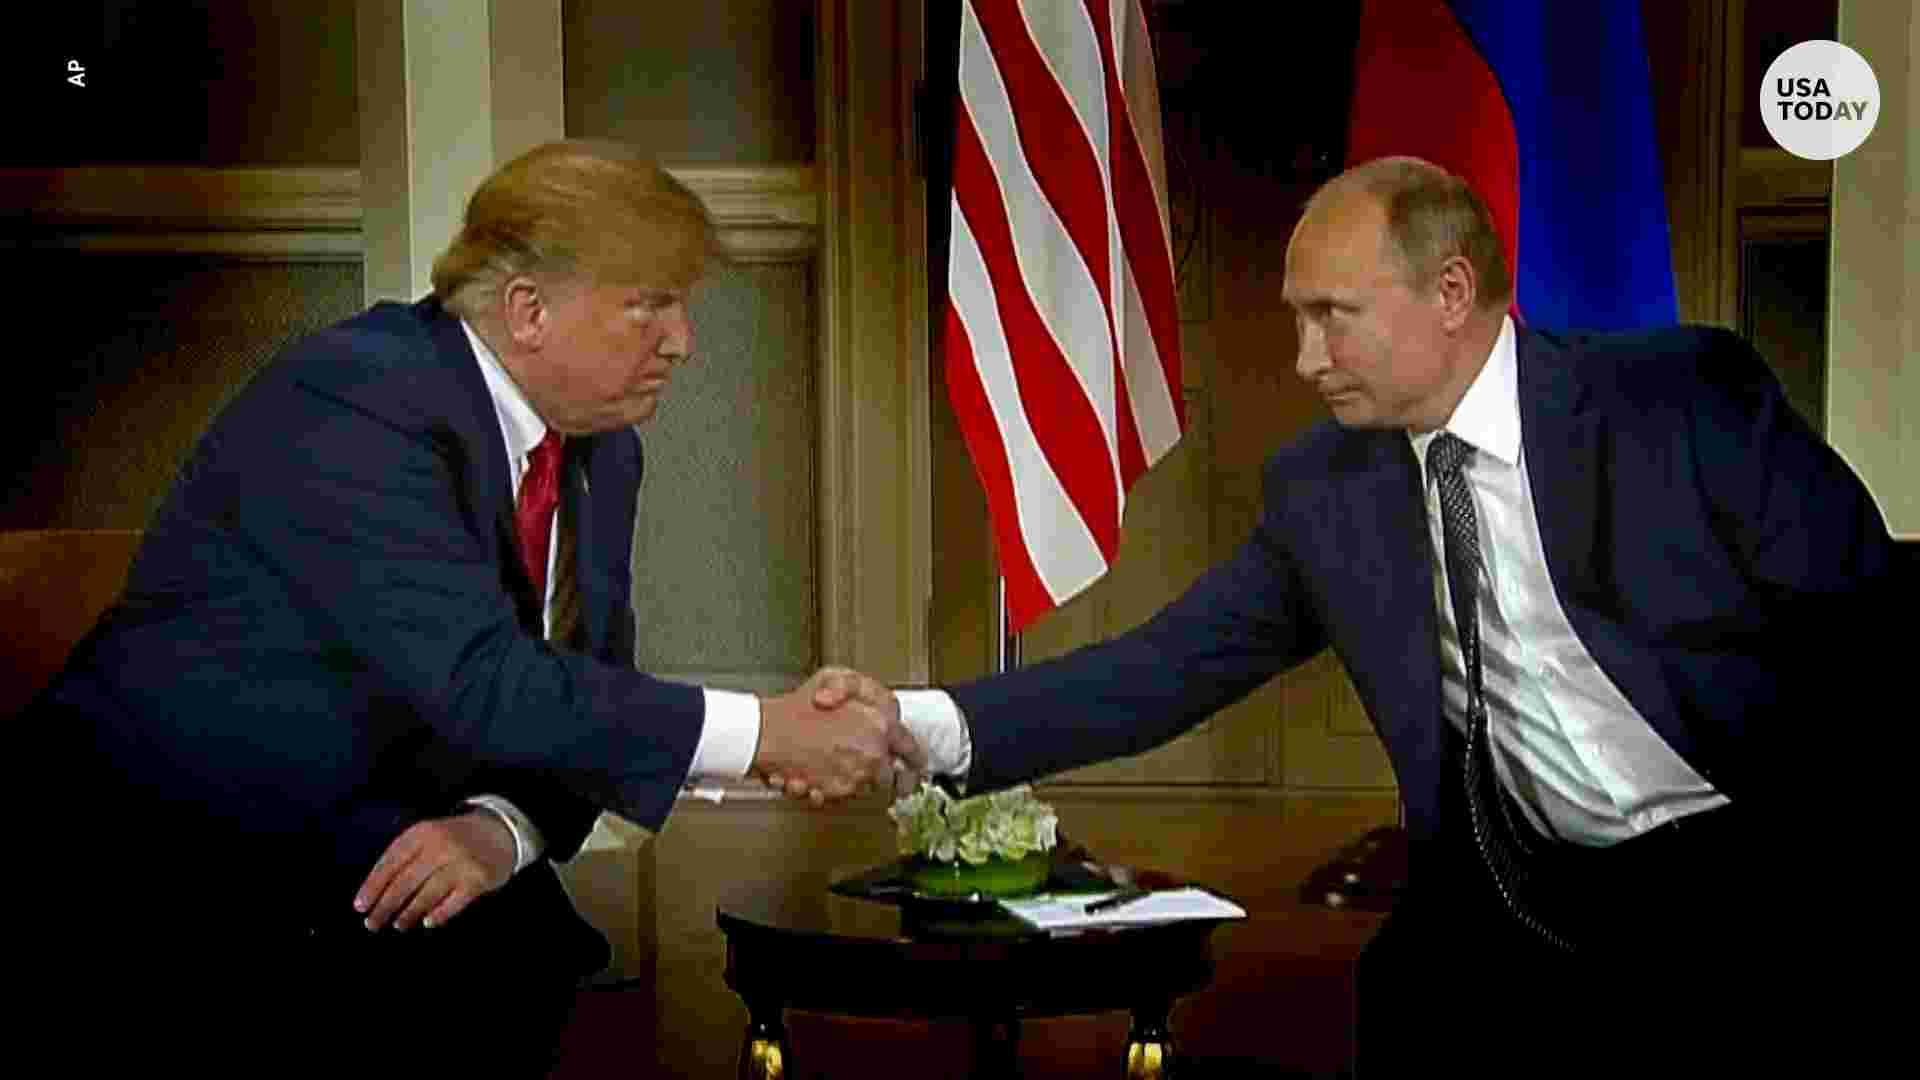 US Election: Republican , Democratic lawmakers criticise Trump's stance on Russia's role